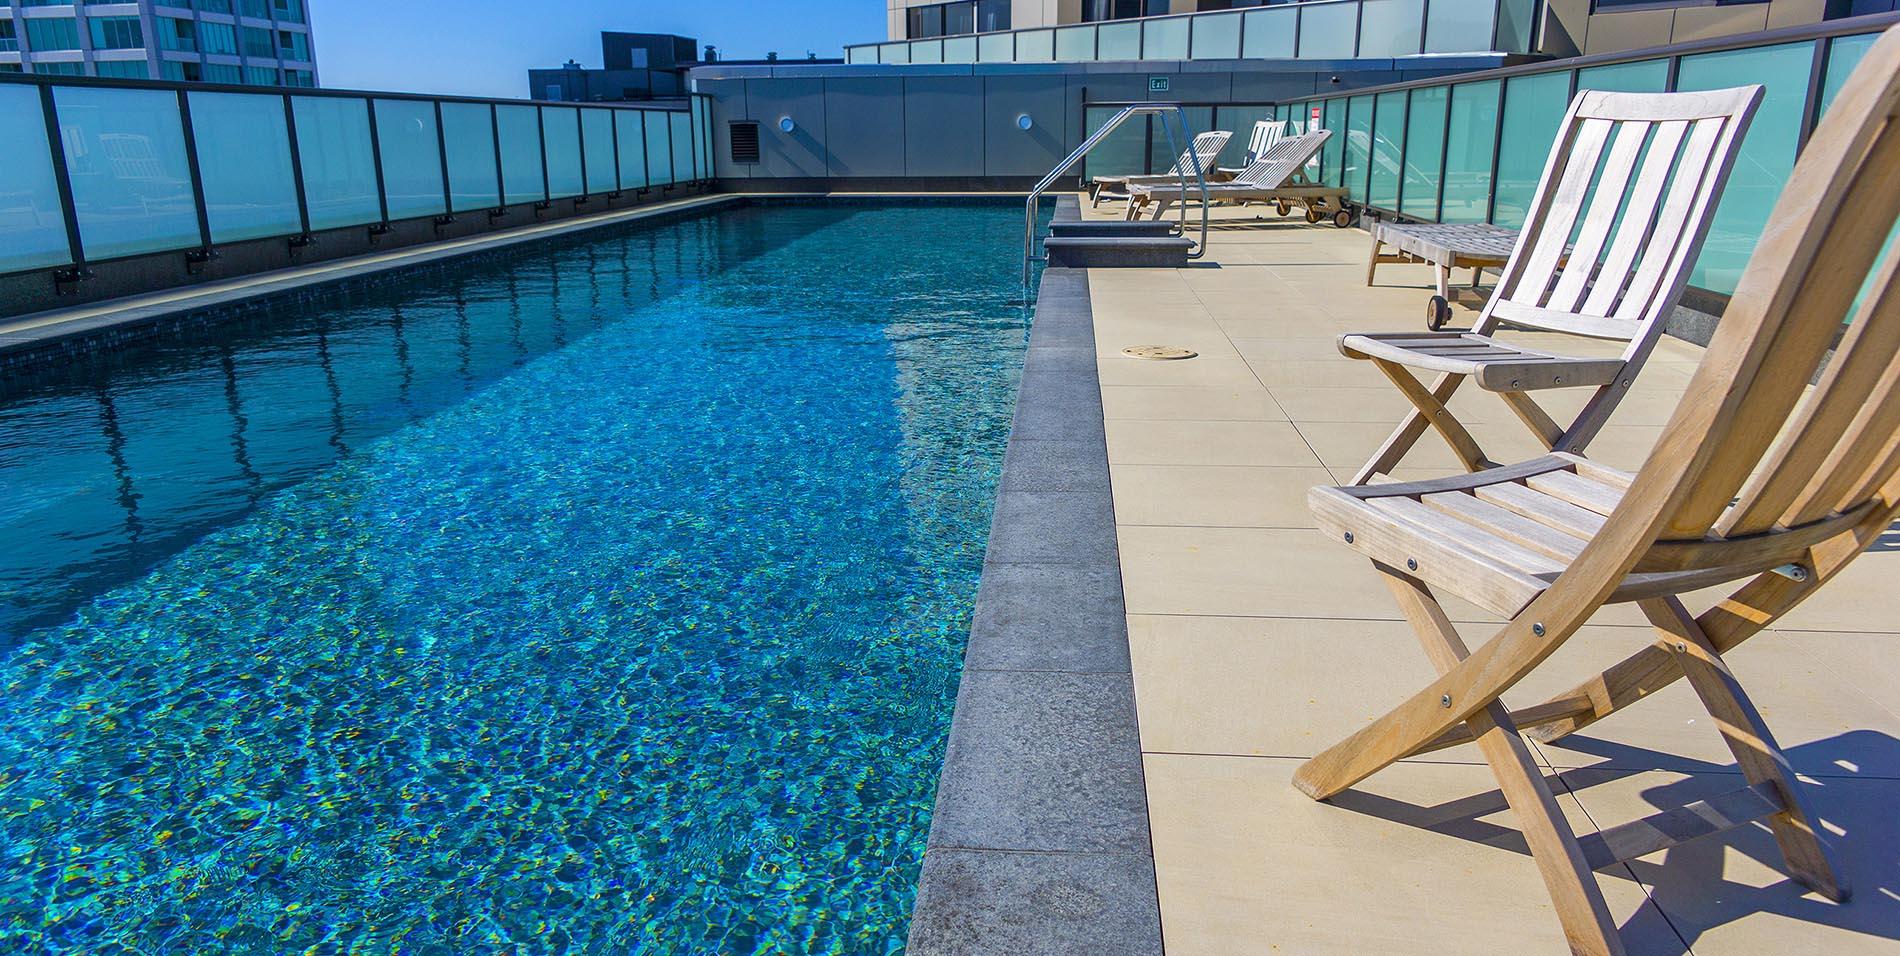 The Spencer Hotel, Takapuna Hotel, Spencer Hotel 25m Lap Pool slideshow HD